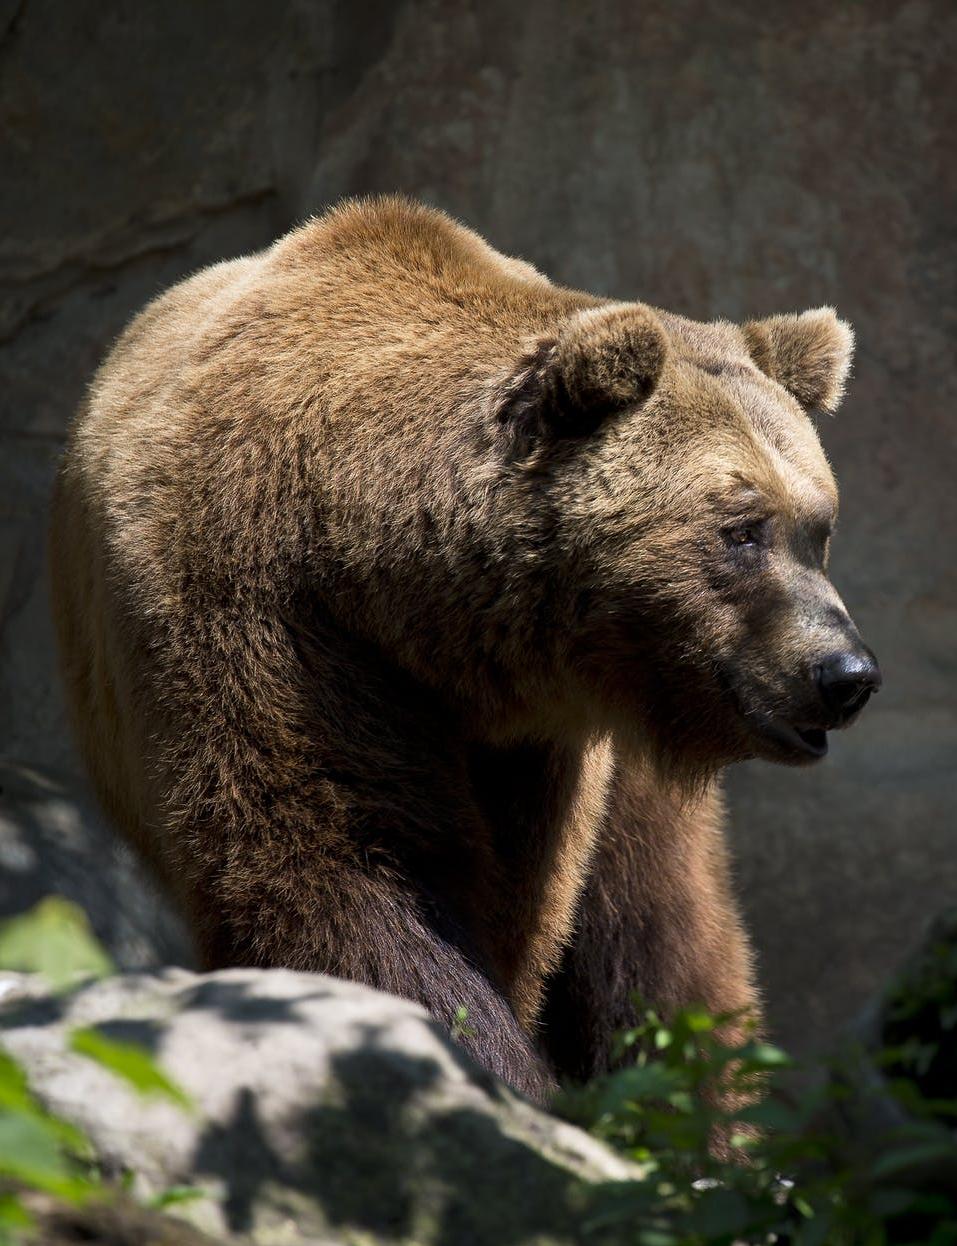 Ciri Ciri Hewan Beruang : hewan, beruang, Hewan, Endemik, Amerika, Serikat